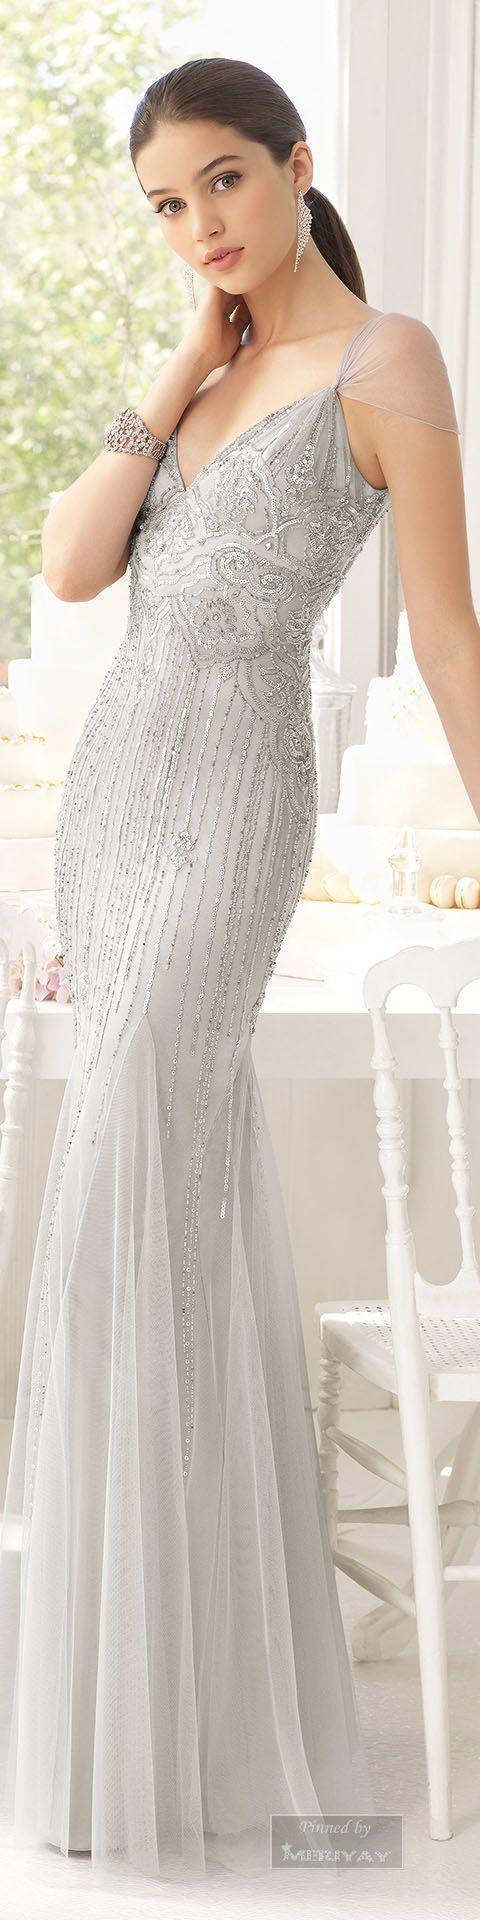 Luxury design dress prom dress vestidos pinterest prom